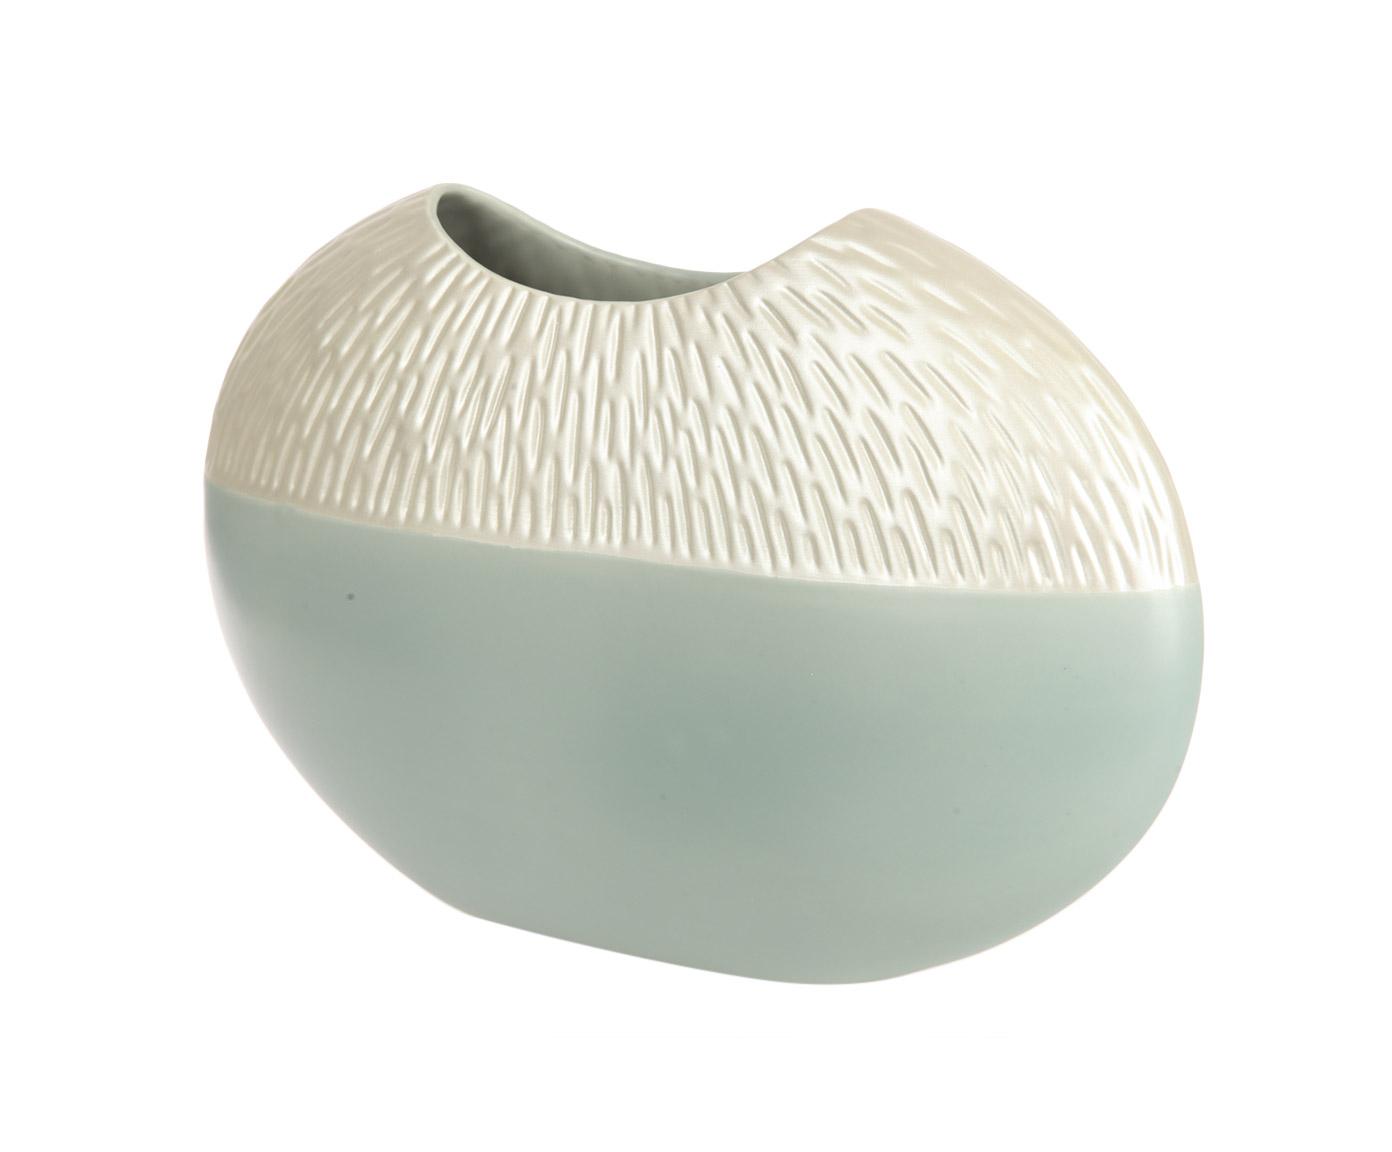 Декоративная ваза Farol 15430066 от thefurnish